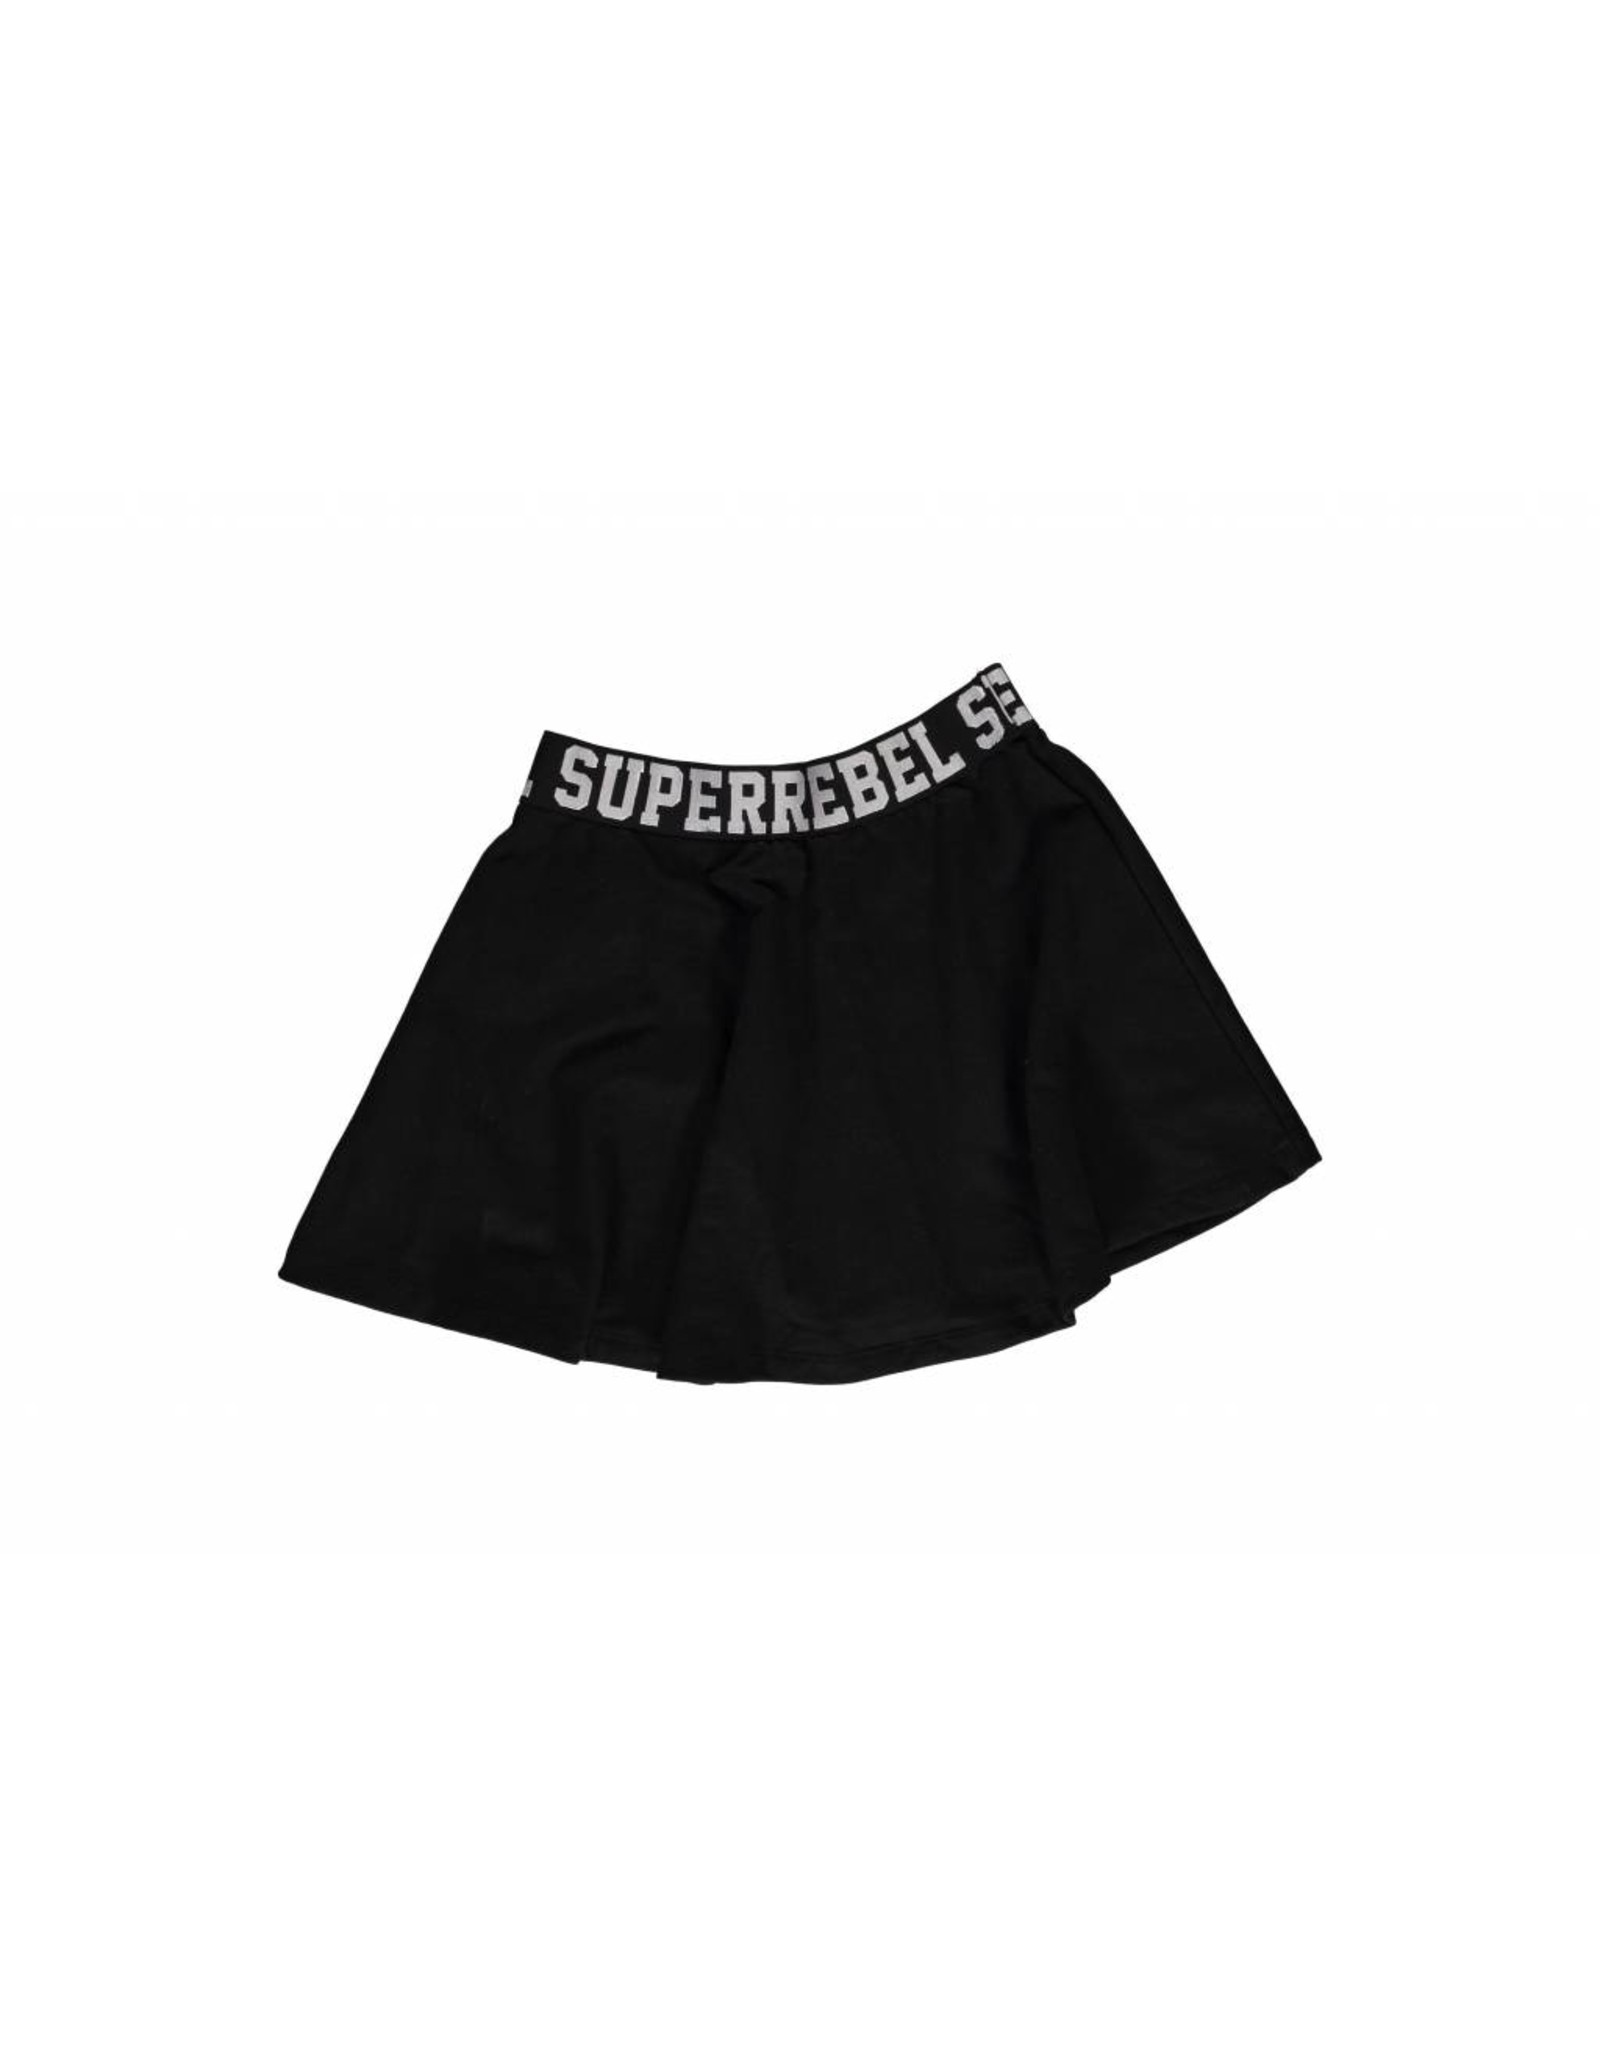 Super Rebel Super Rebel Girls sweat skirt black